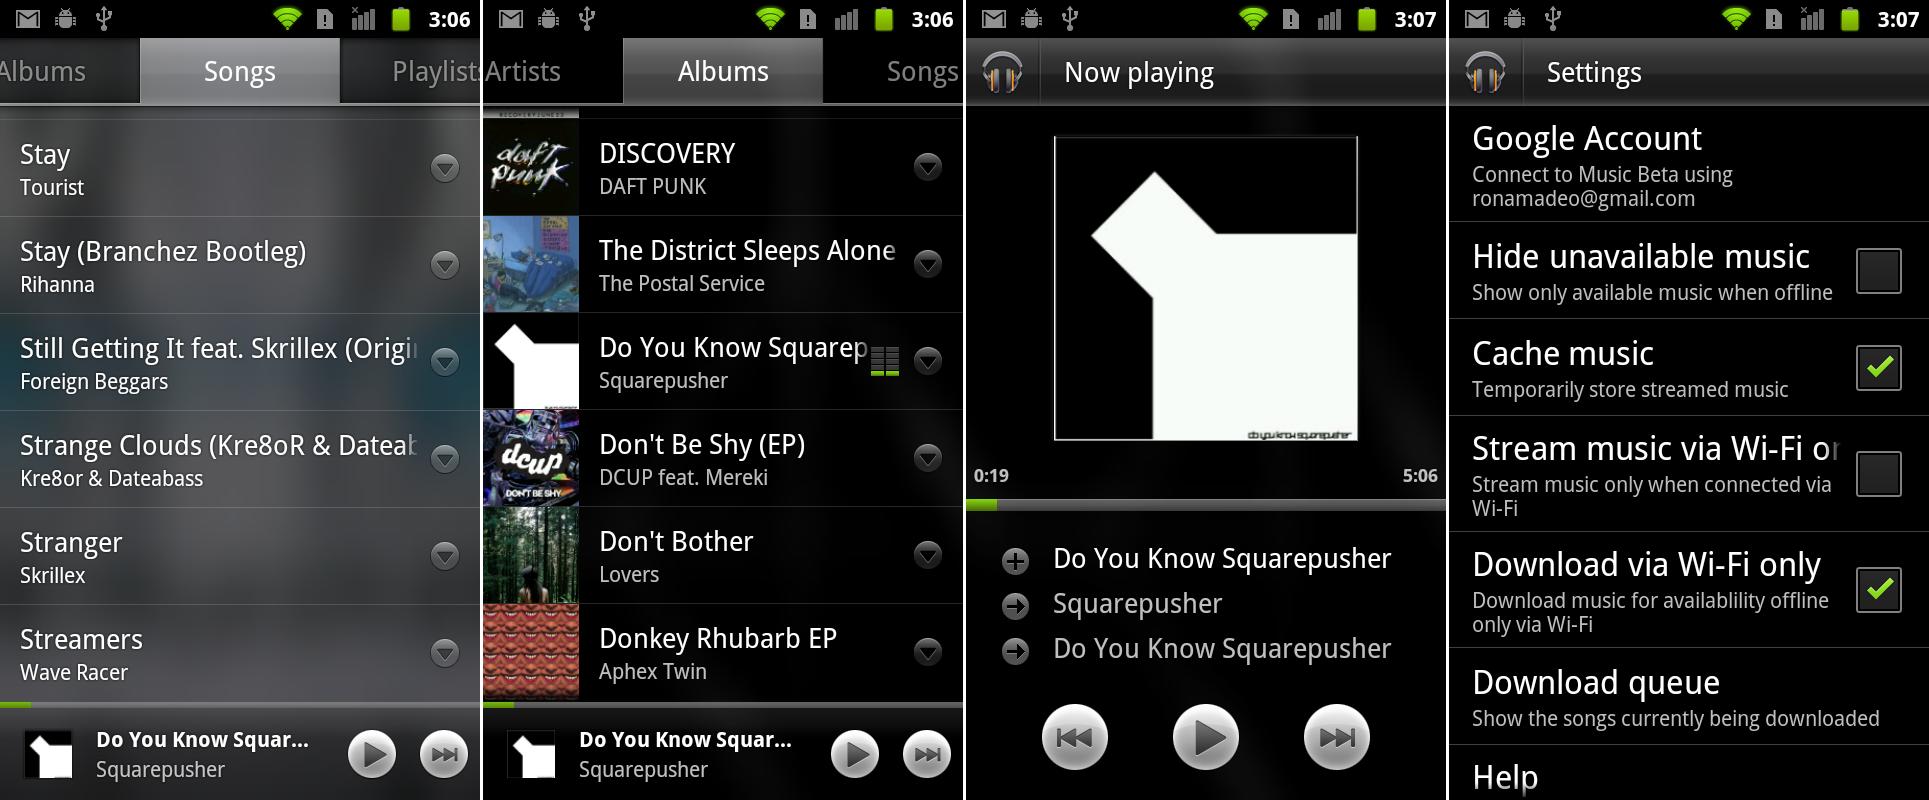 Google Music Beta running on Gingerbread.